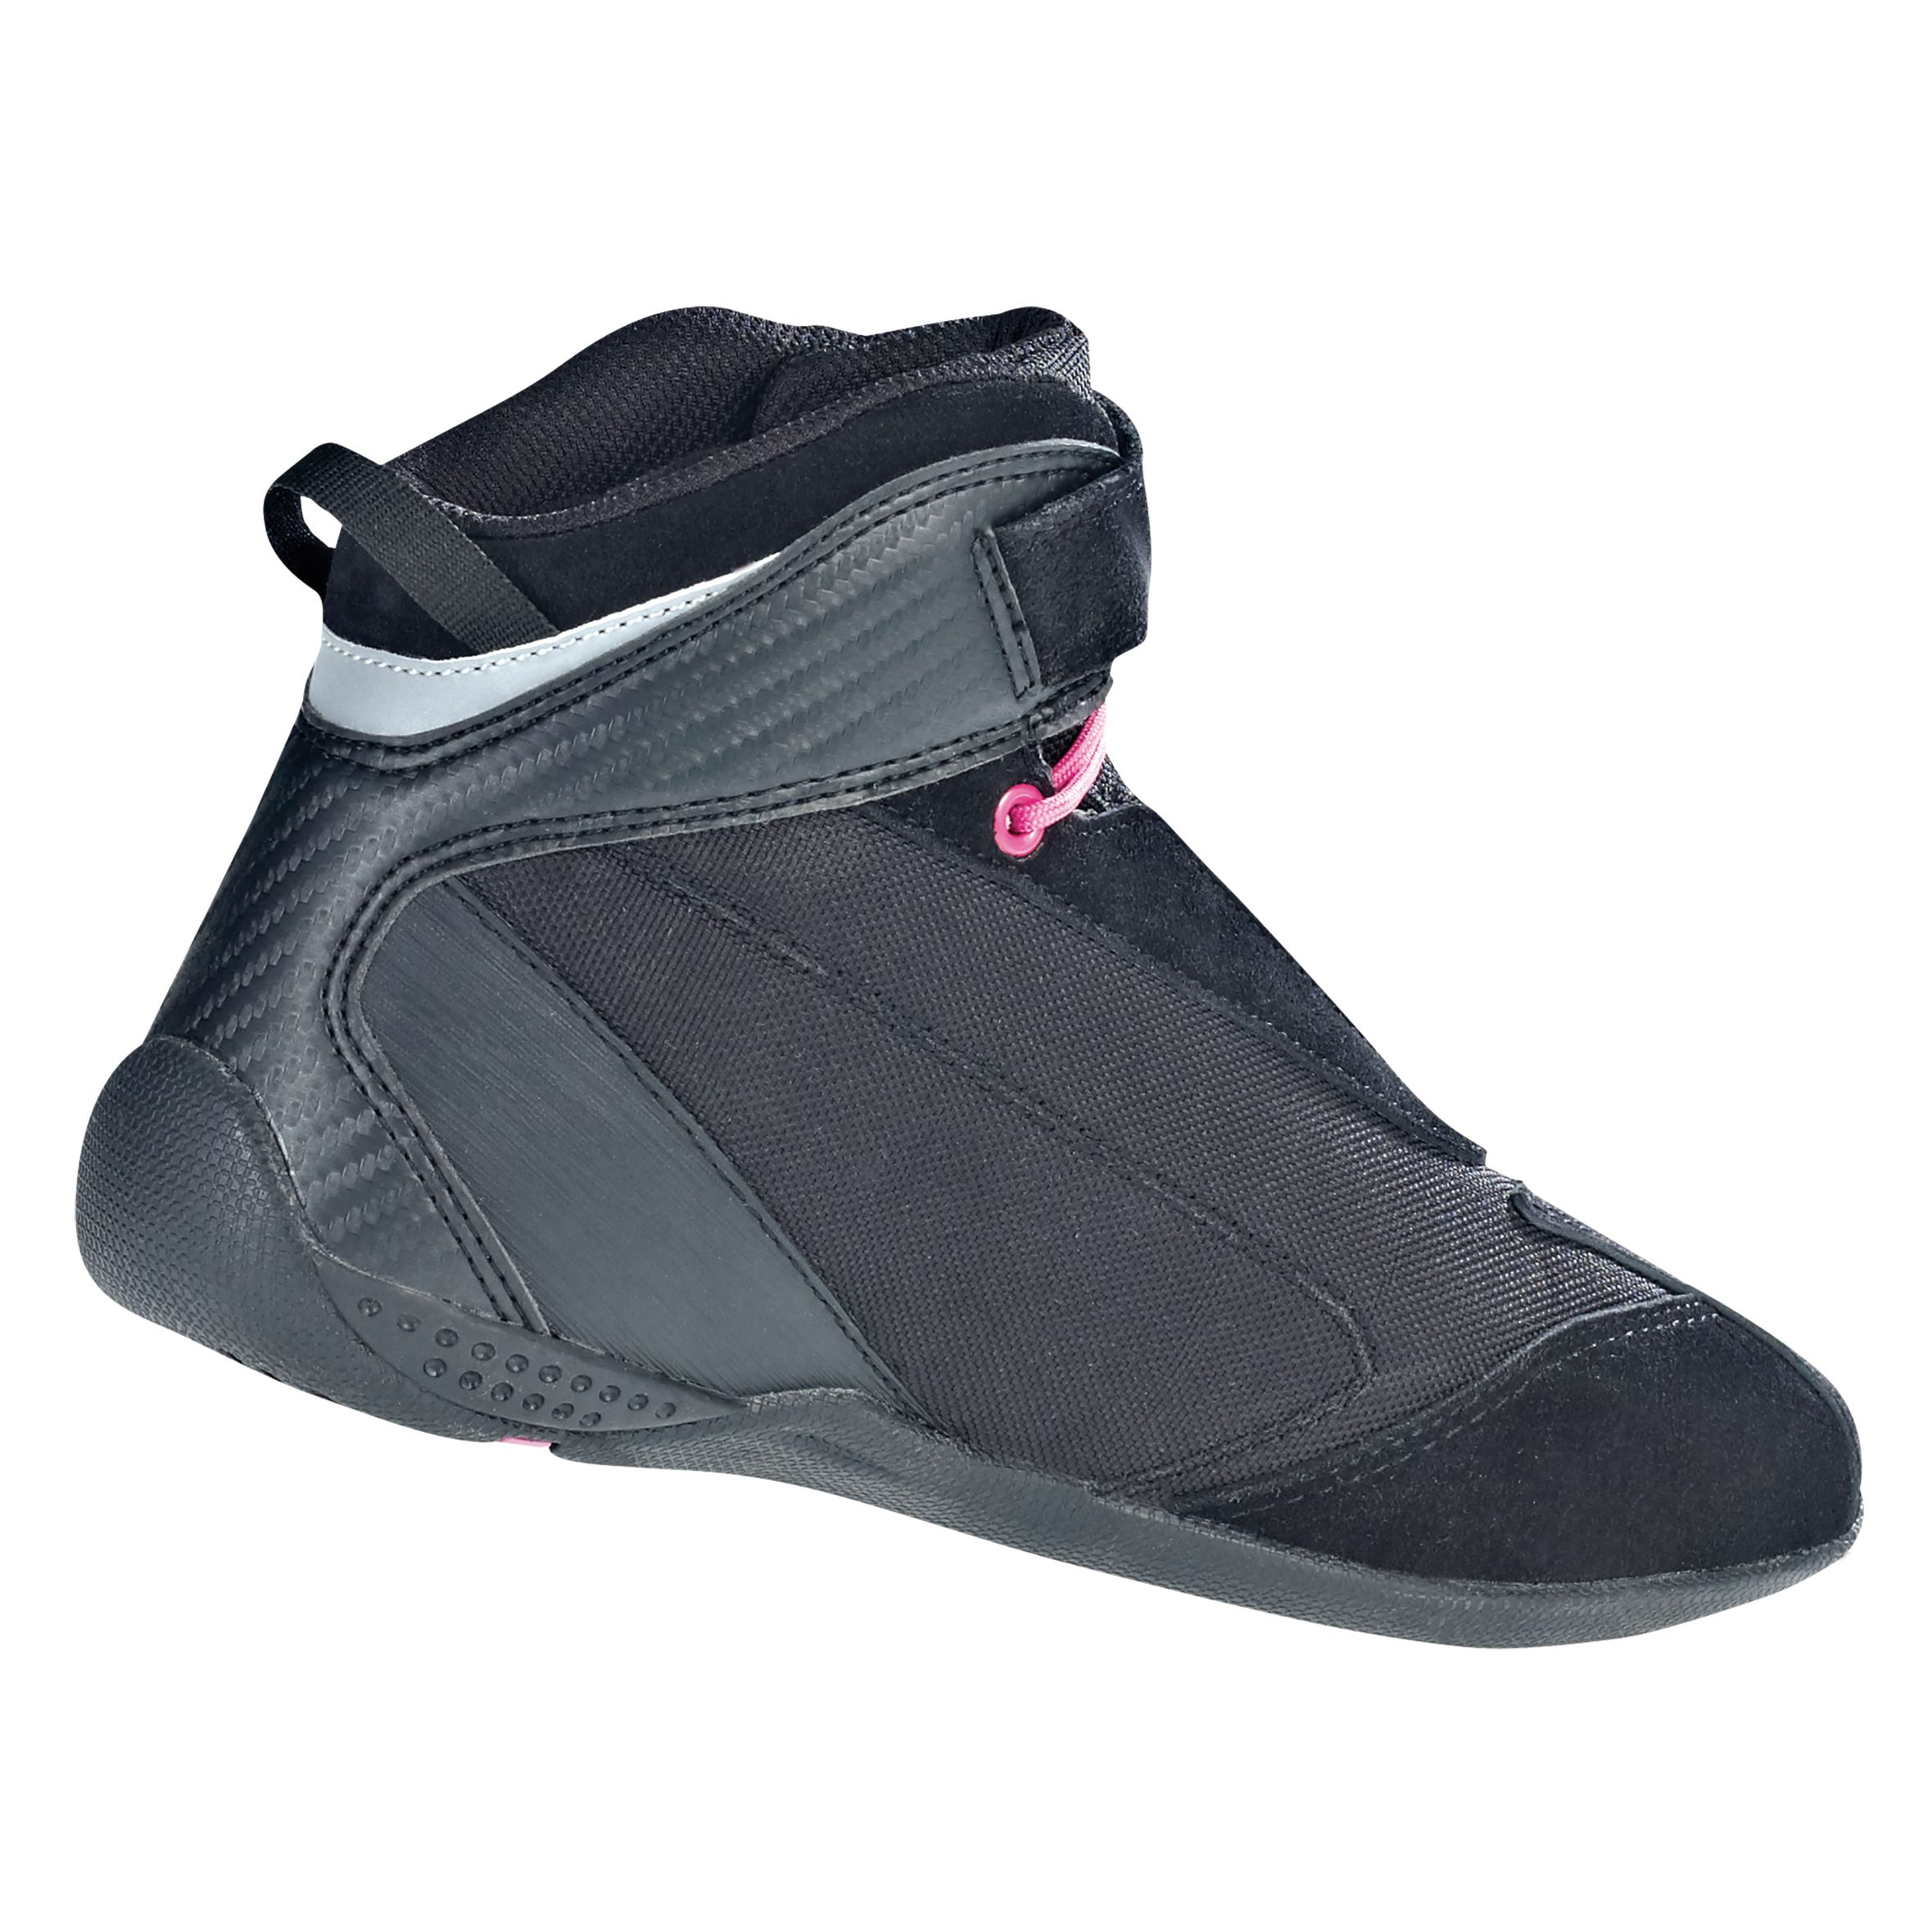 Baskets Bottes De Serie Fin Ixon Et Lady Speeder Chaussures rxYwOrEq